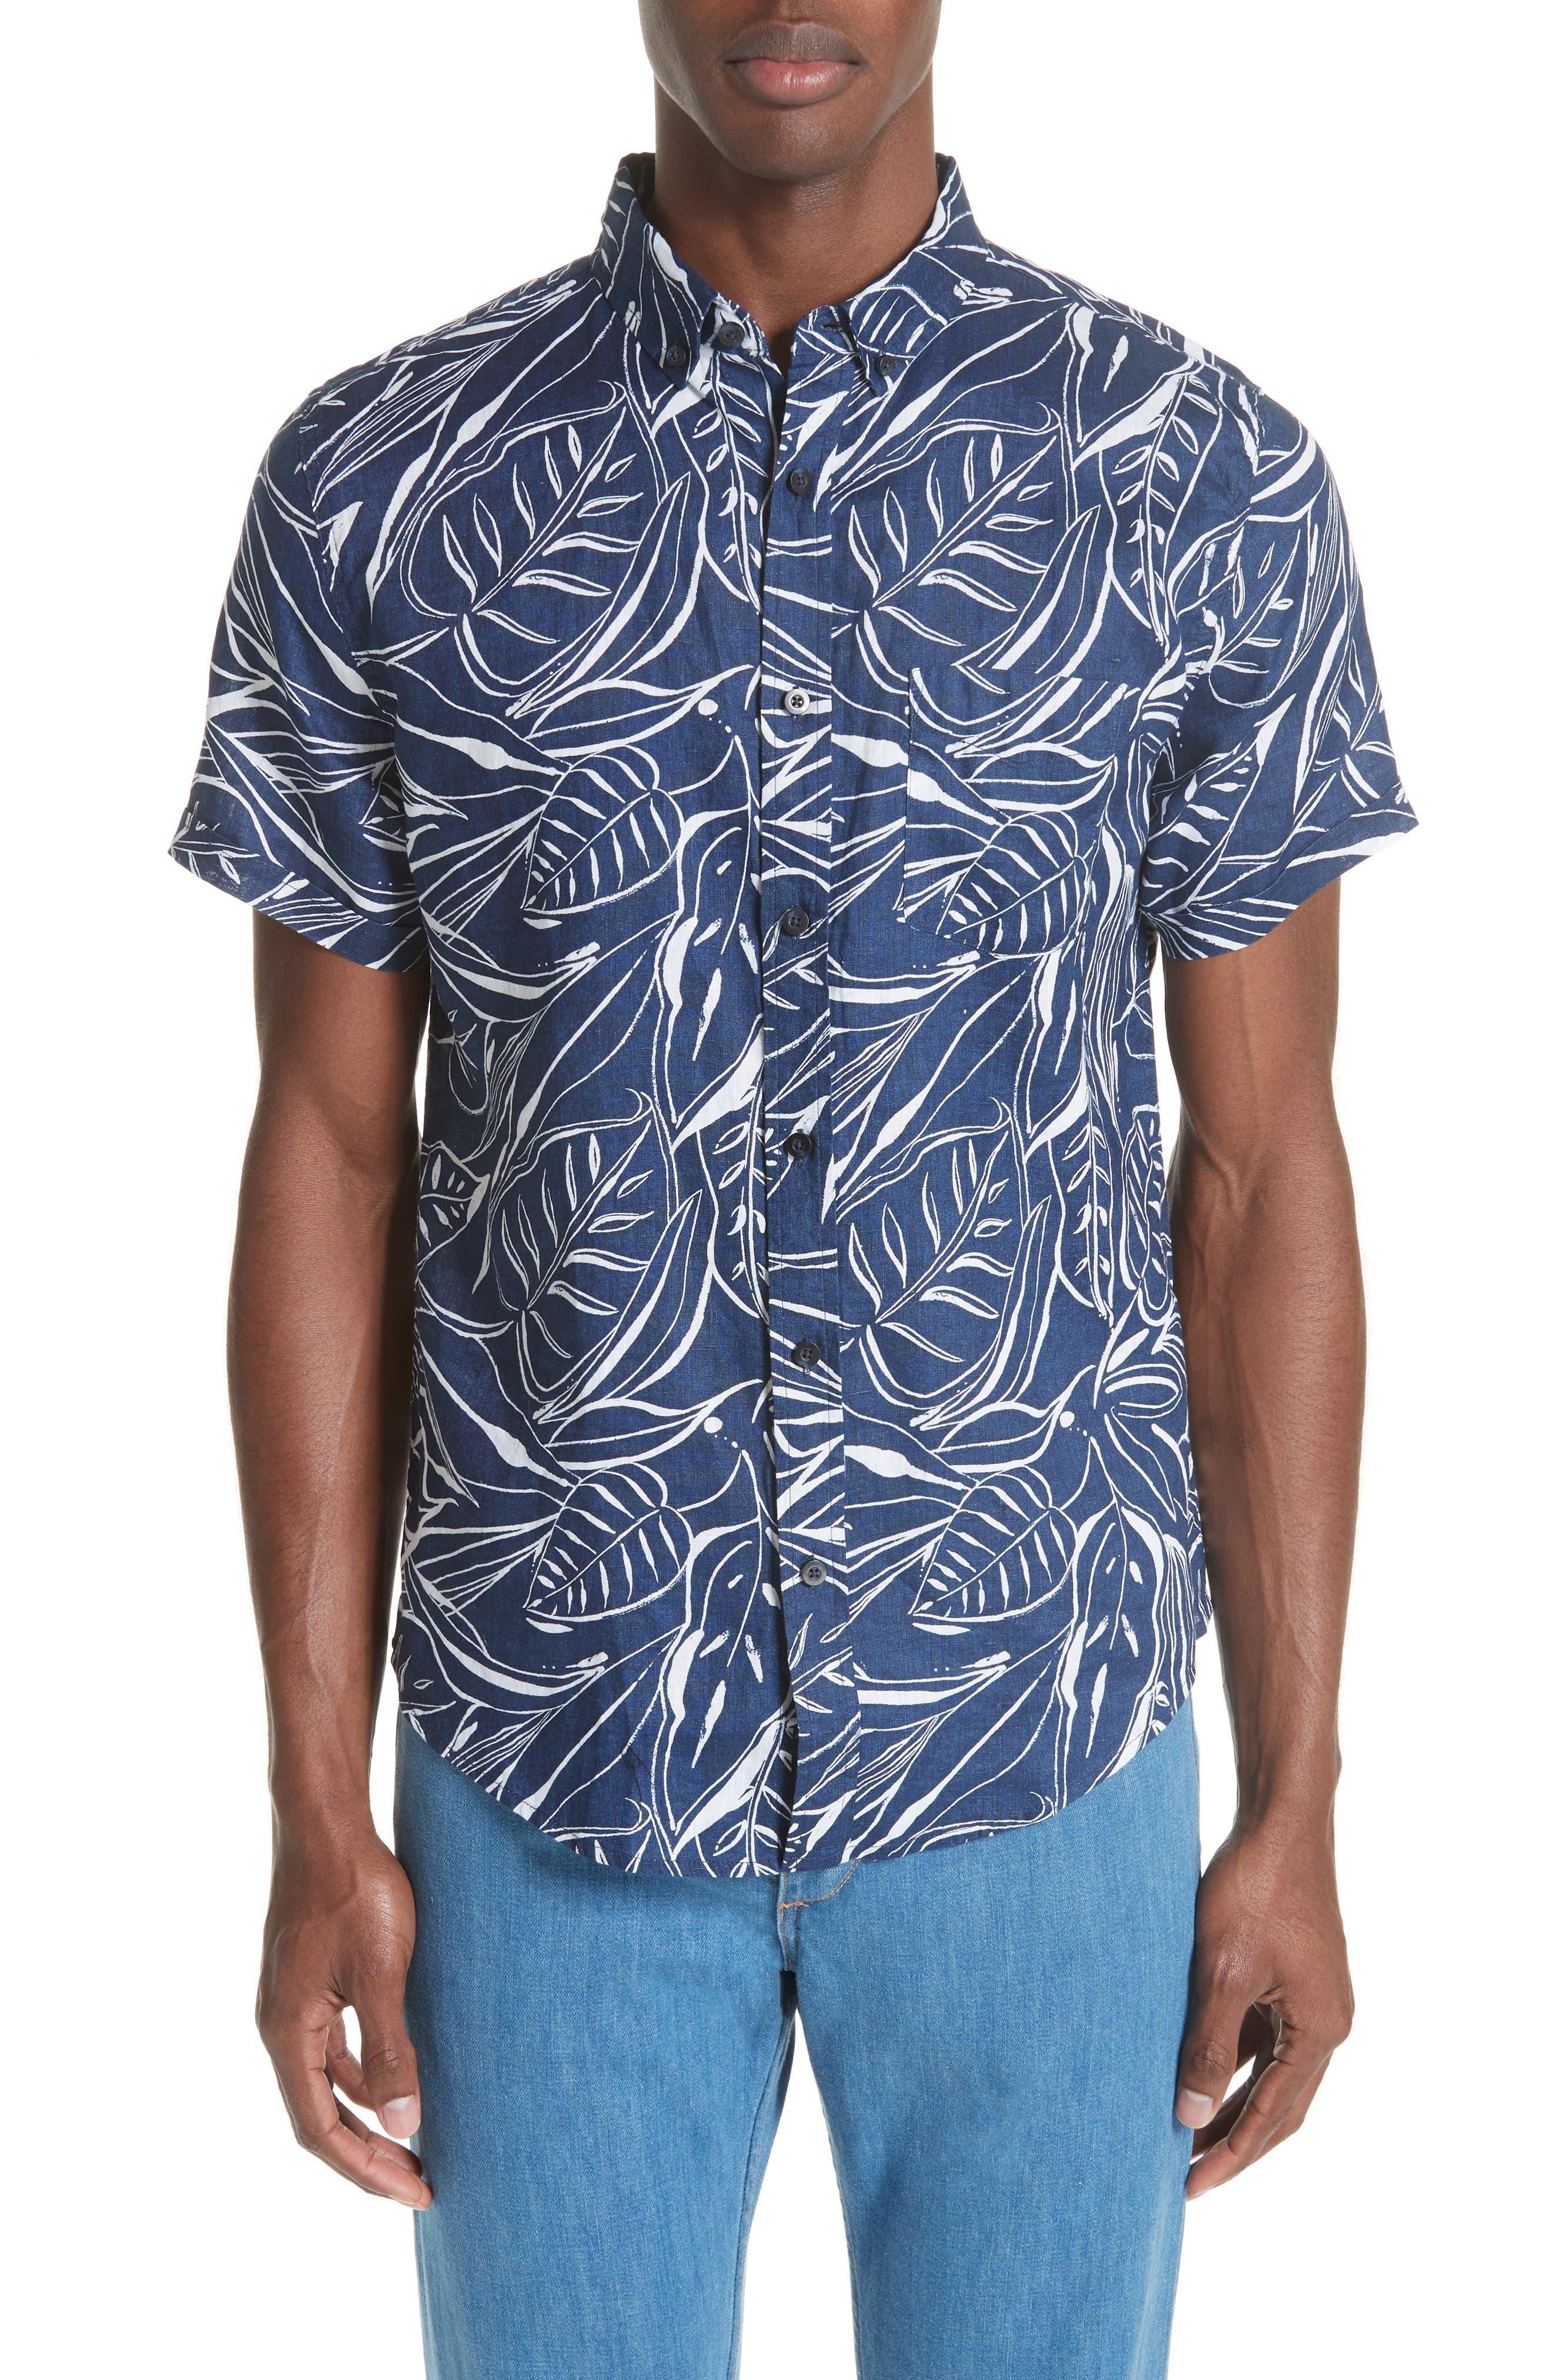 Jack Palm Print Linen Shirt,                         Main,                         color, DEEP NAVY WHITE